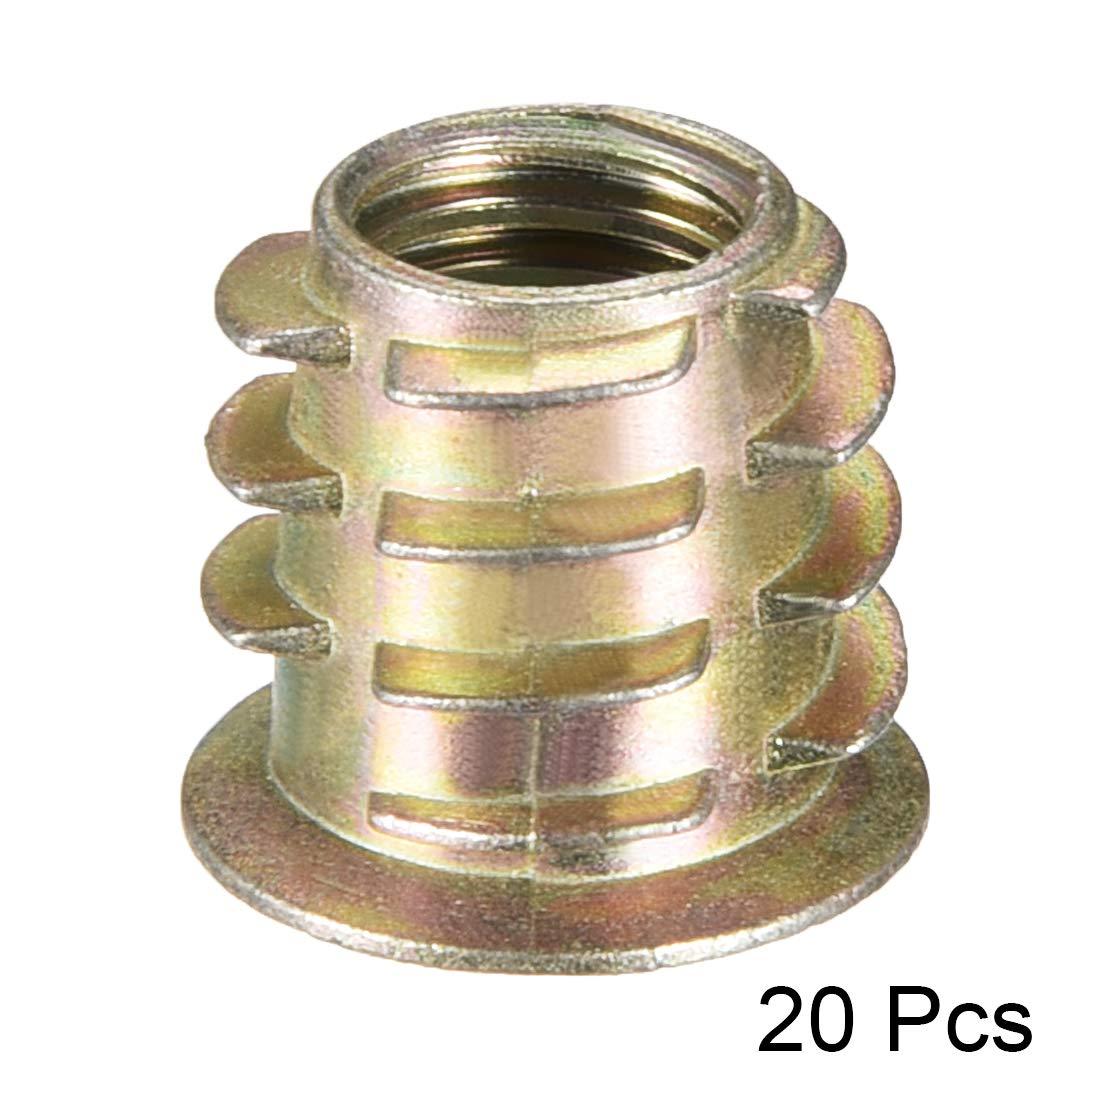 uxcell Wood M10x25mm Hex Socket Screw in Thread Zinc Plated Insert Nut 11Pcs a15062900ux0142